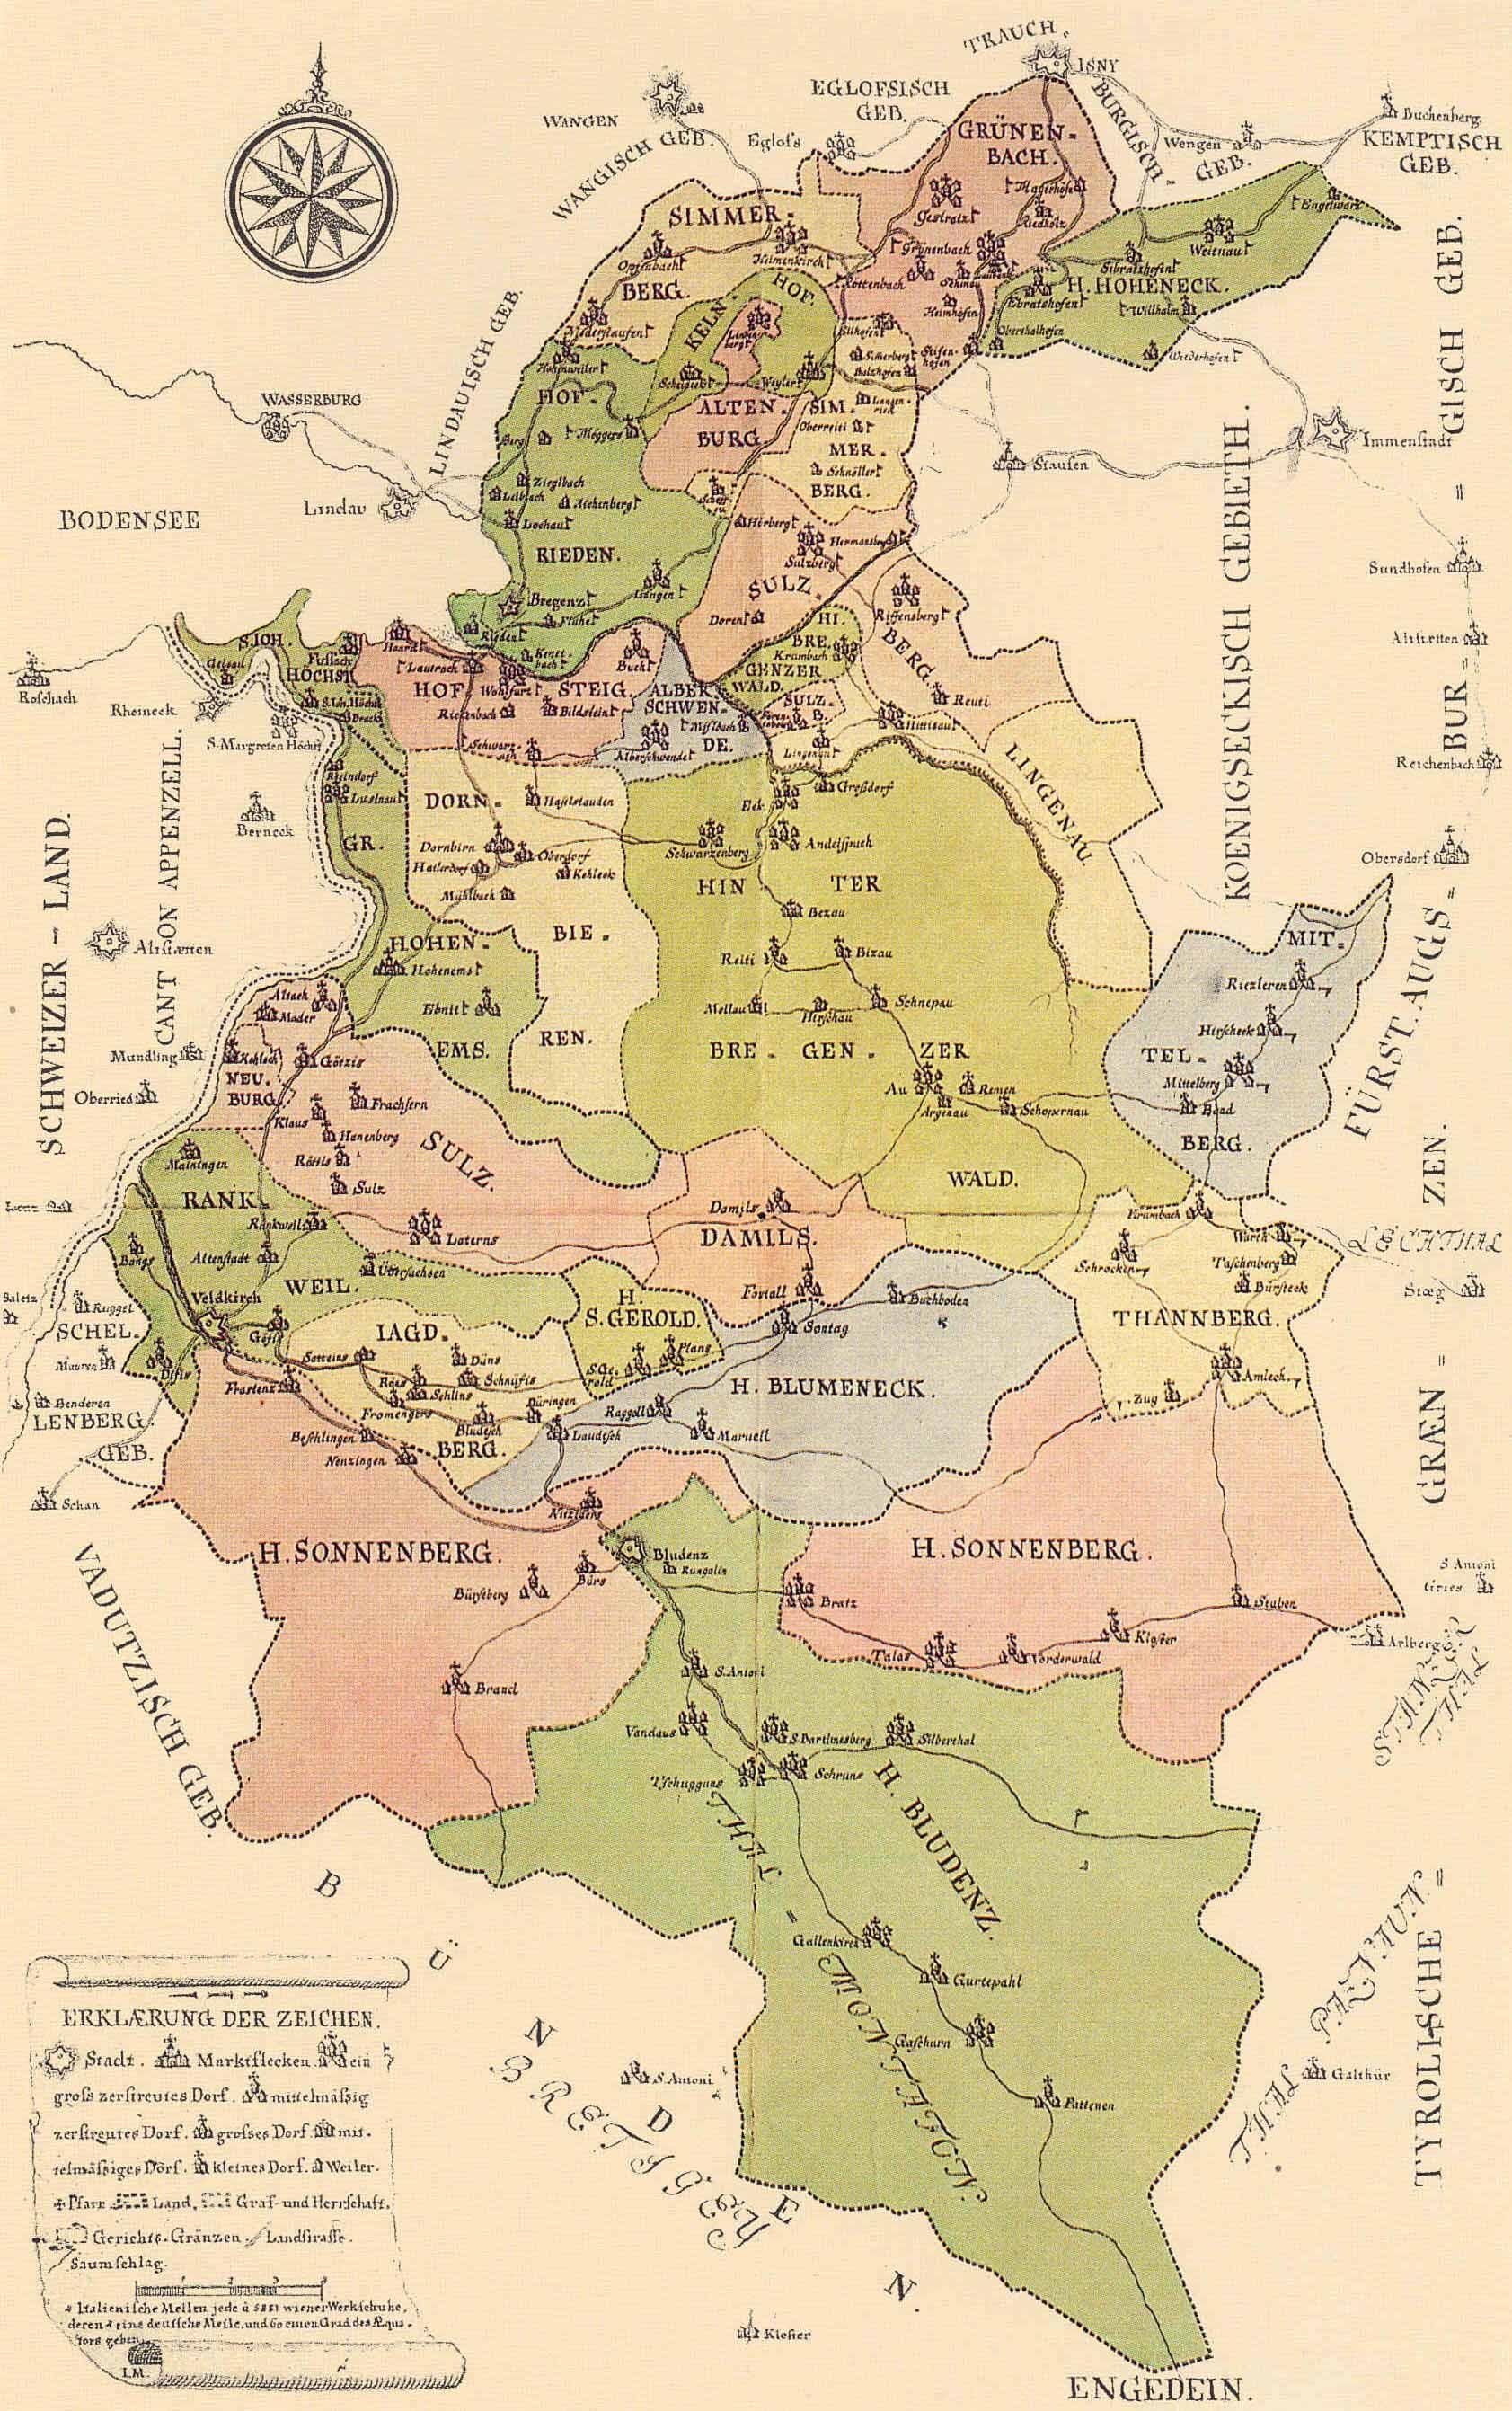 vorarlberg karte File:Vorarlberg oud2.   Wikimedia Commons vorarlberg karte